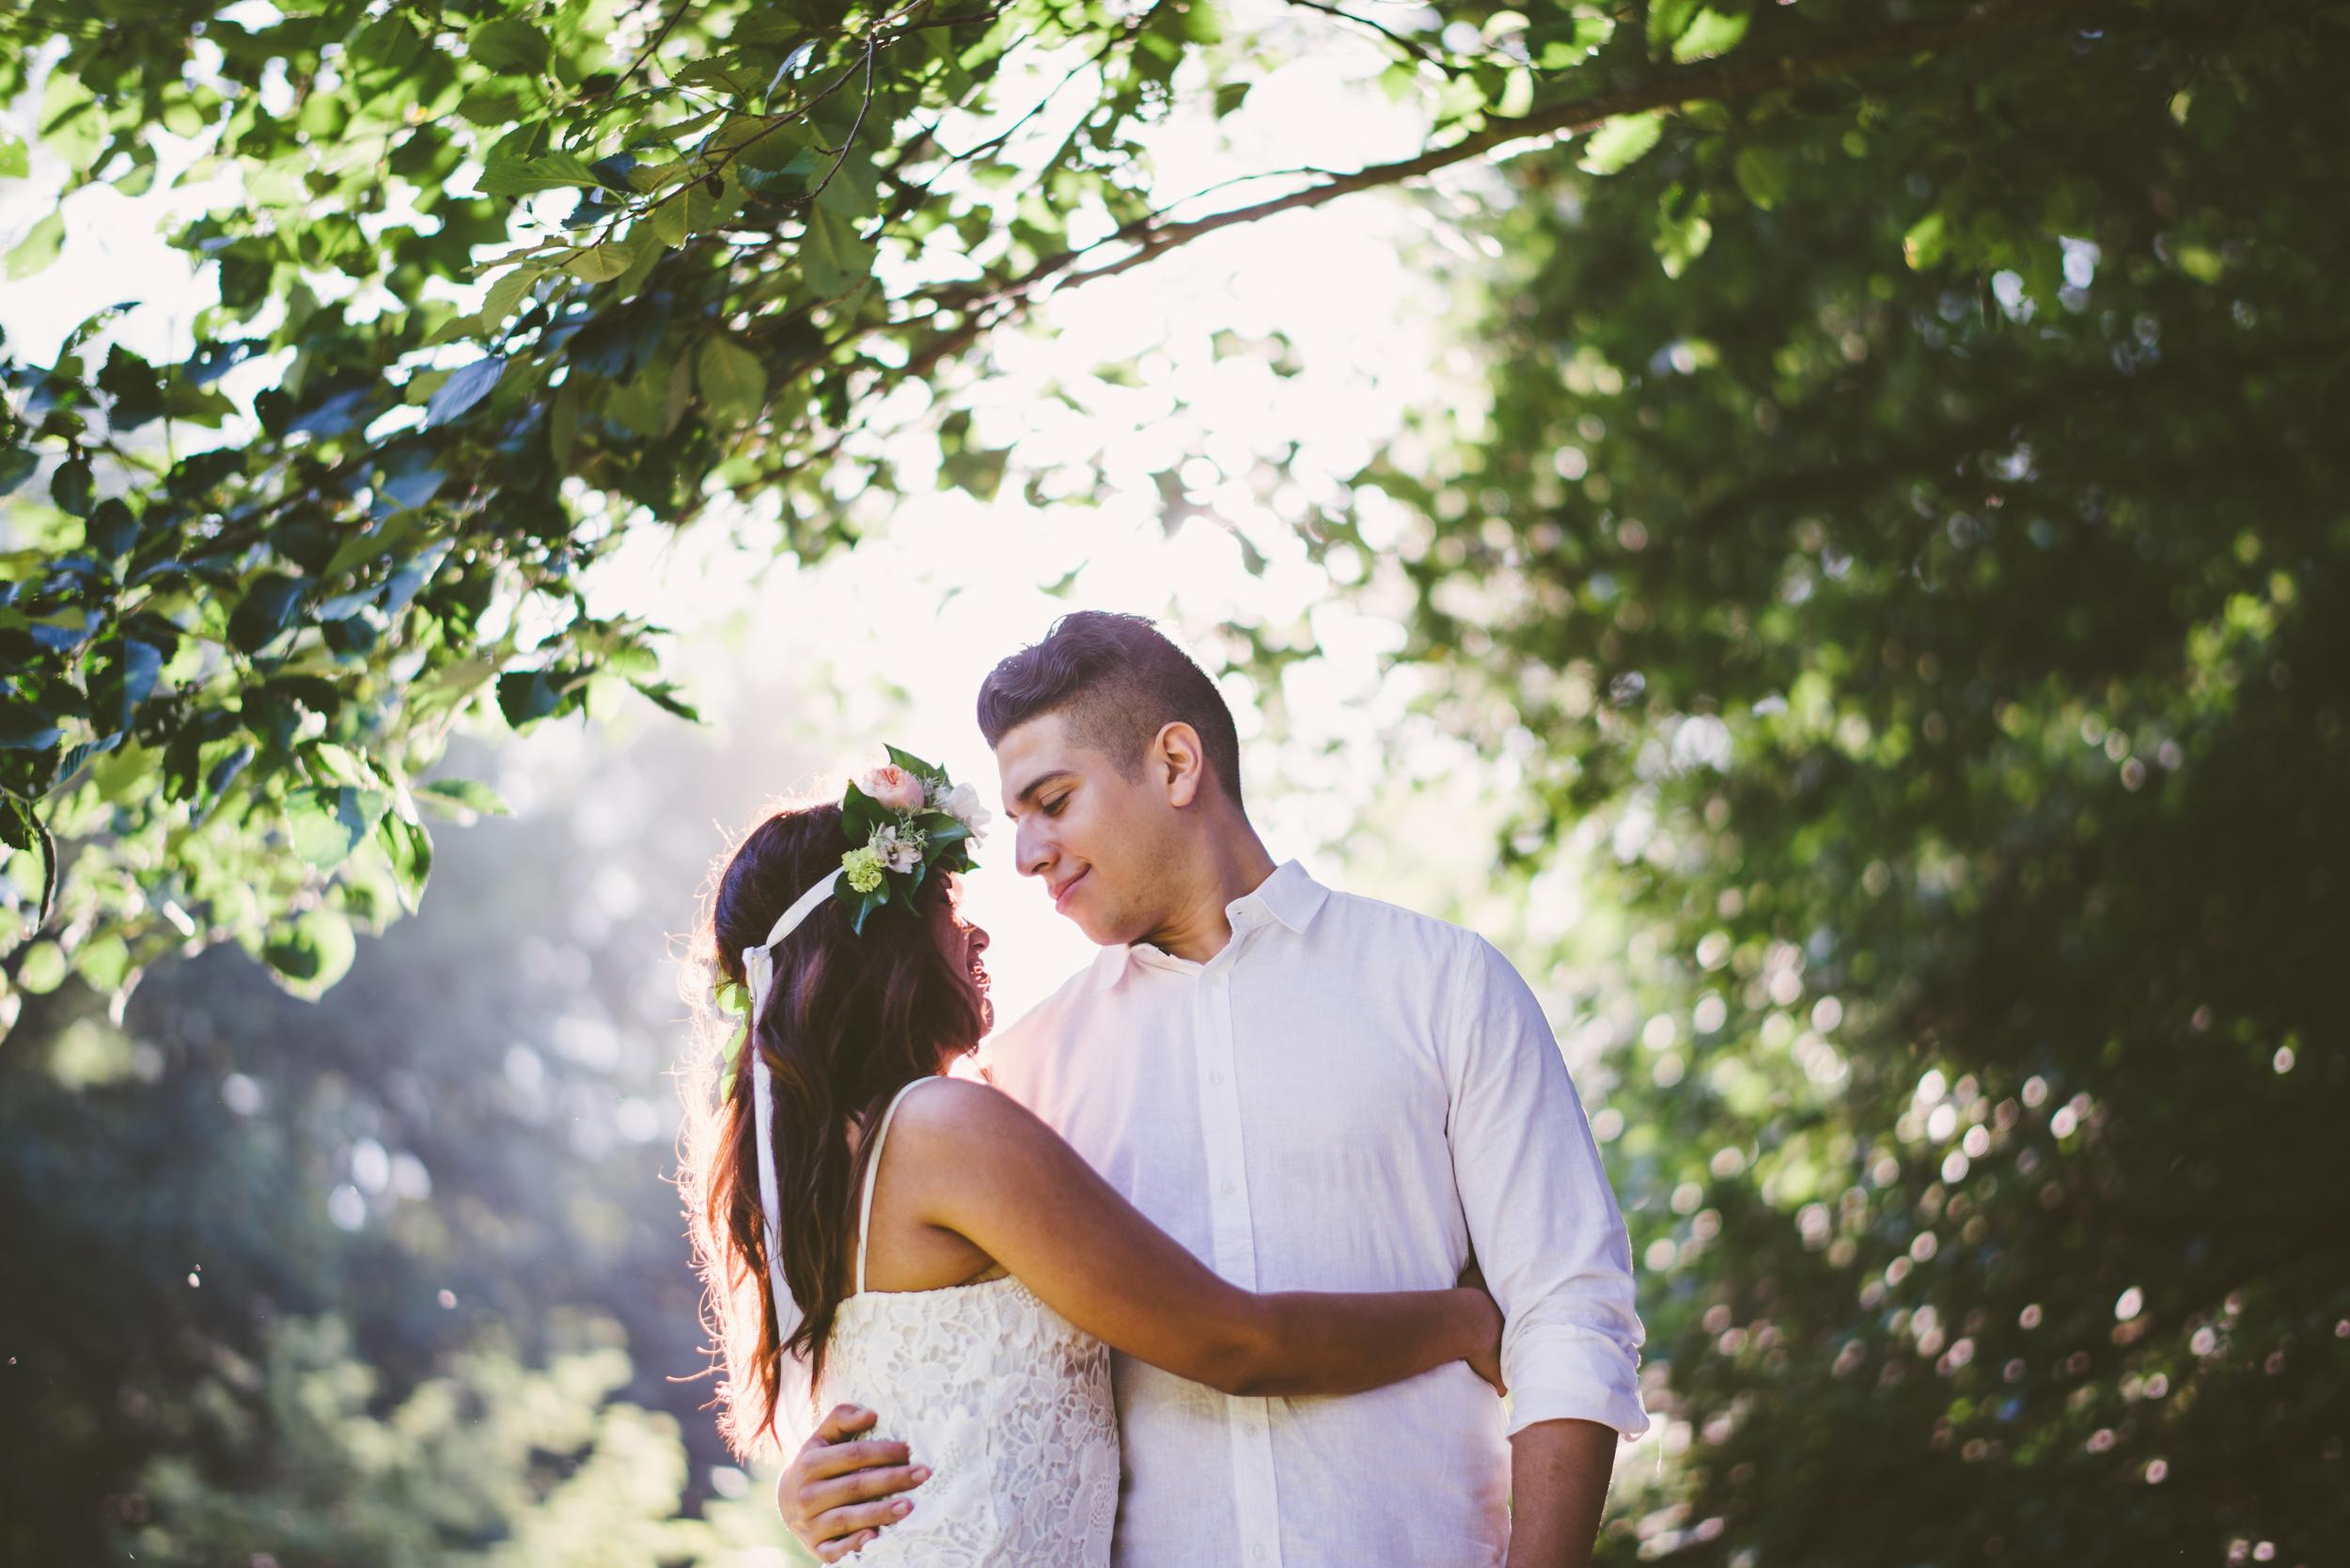 Ricardo & Stephanie - Engagement - © Dallas Kolotylo Photography - 53.jpg